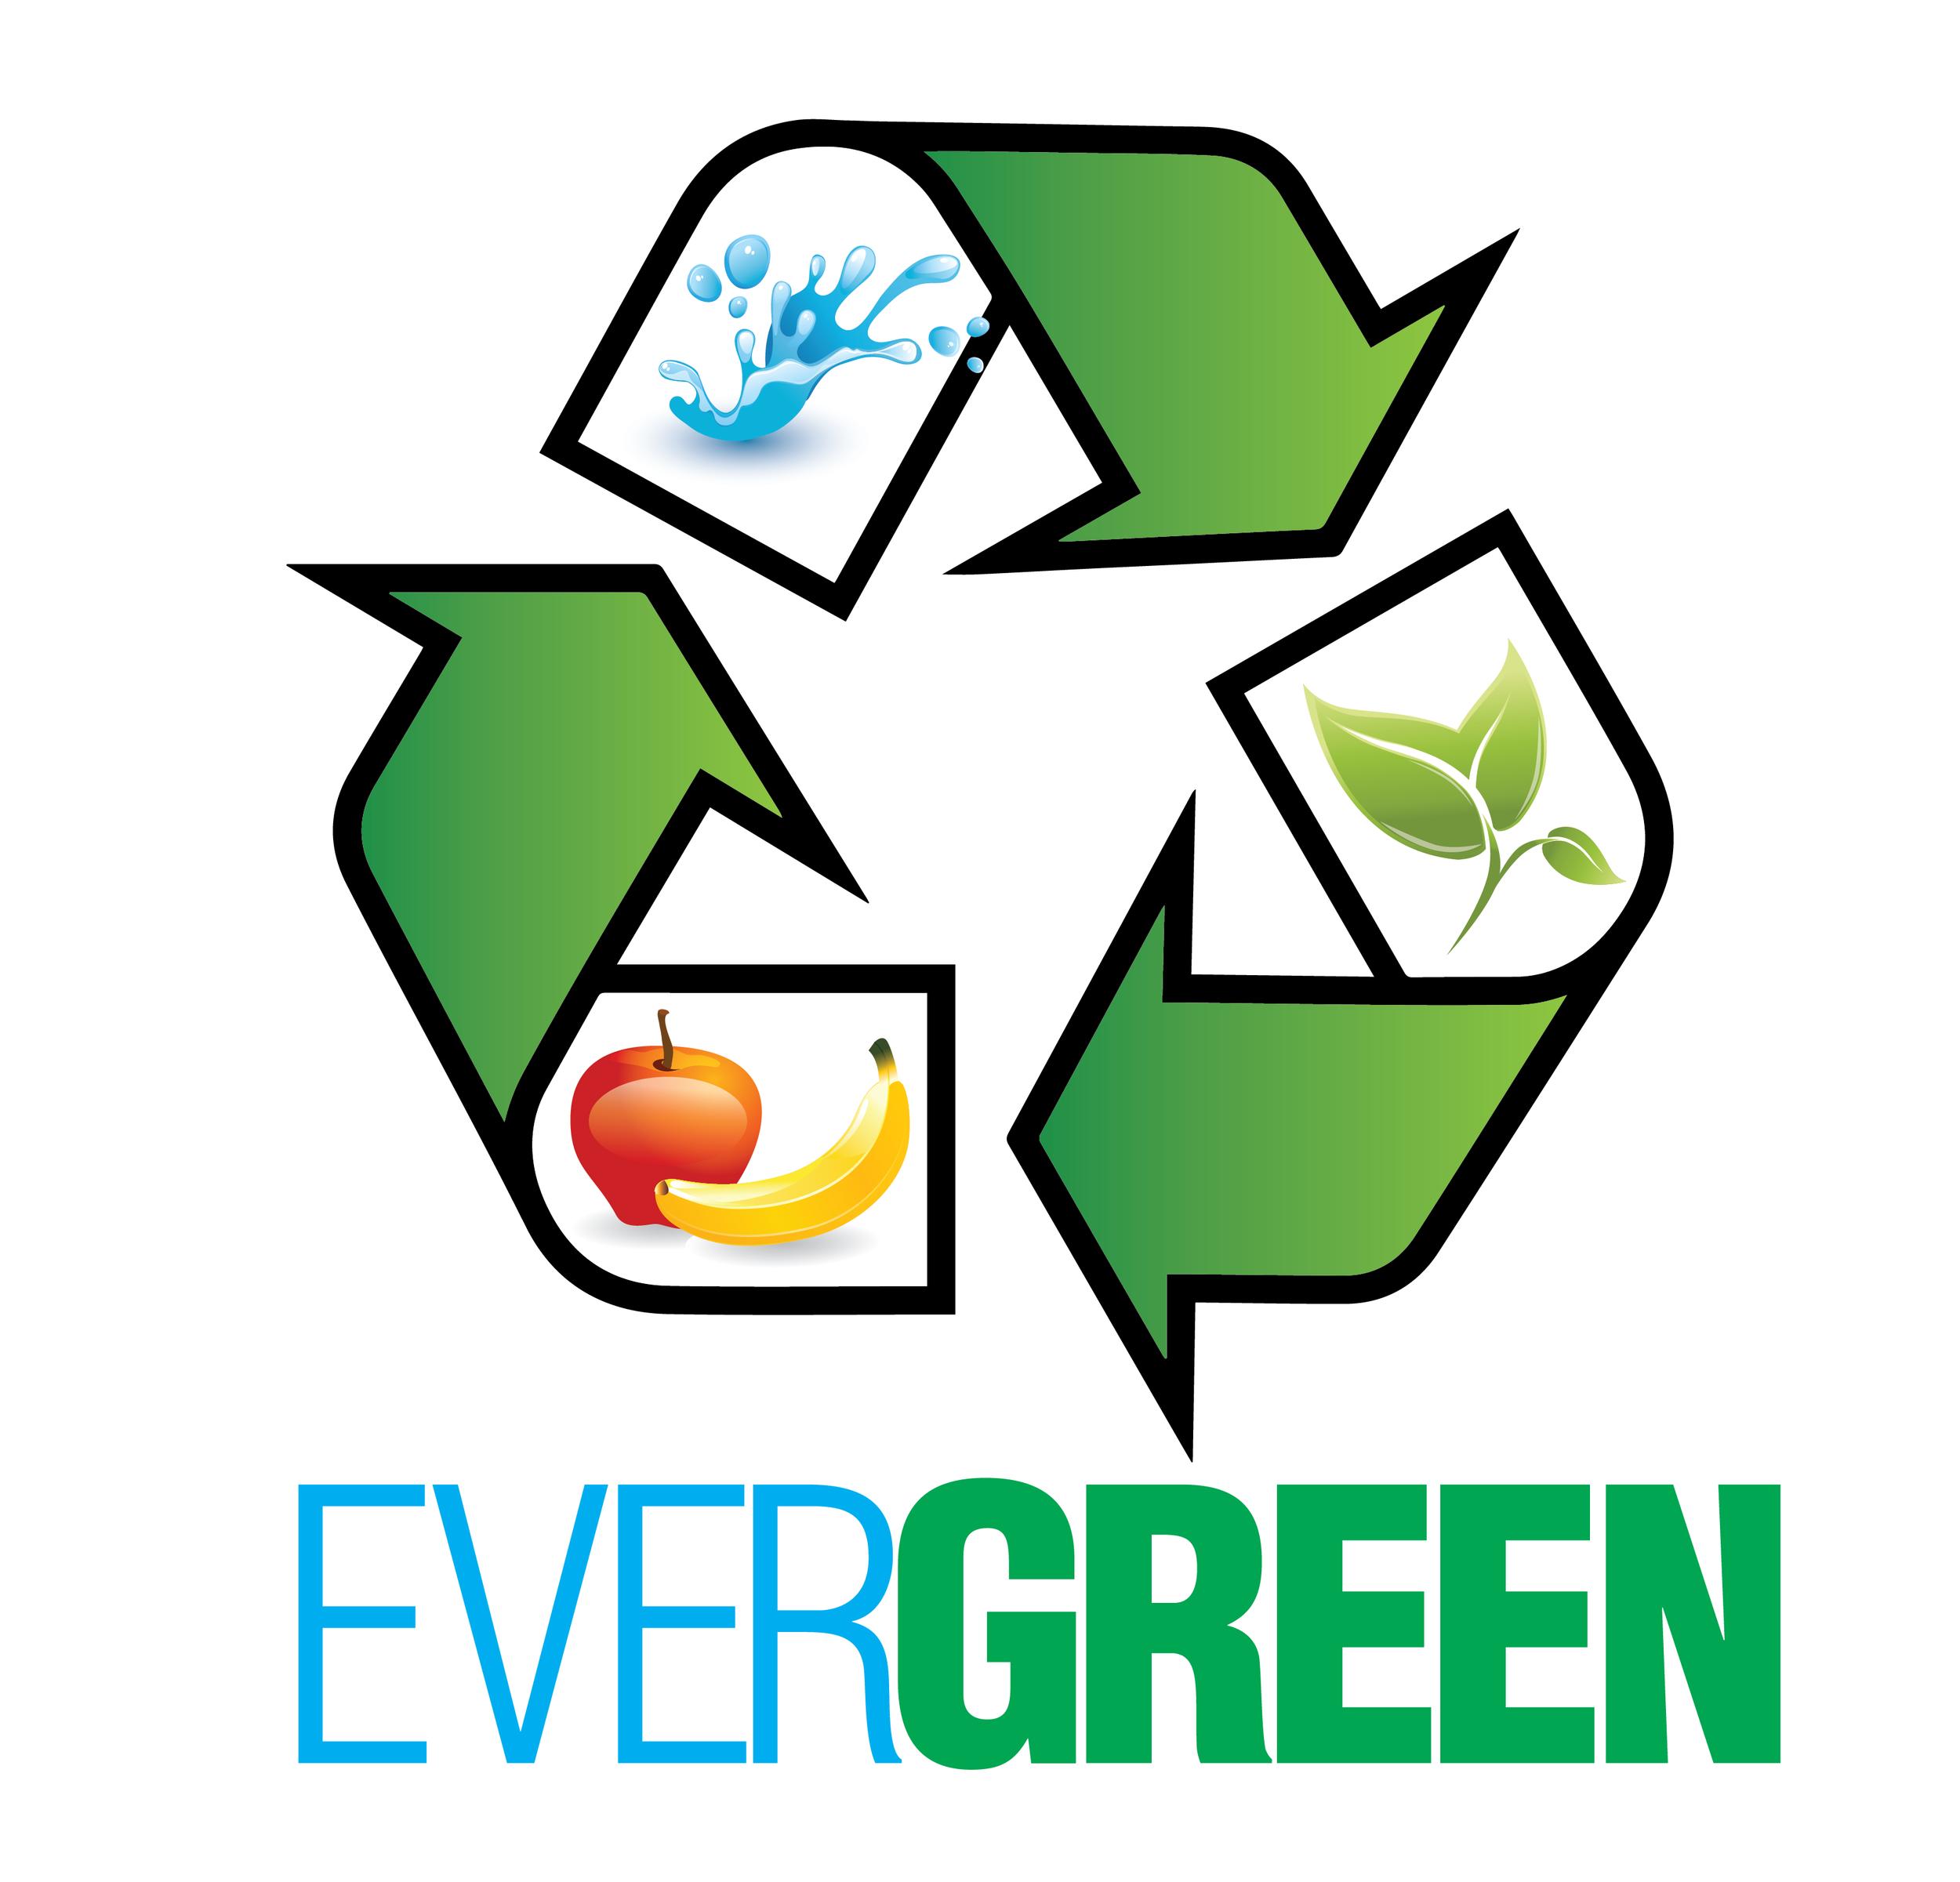 EverGreen Recycling logo